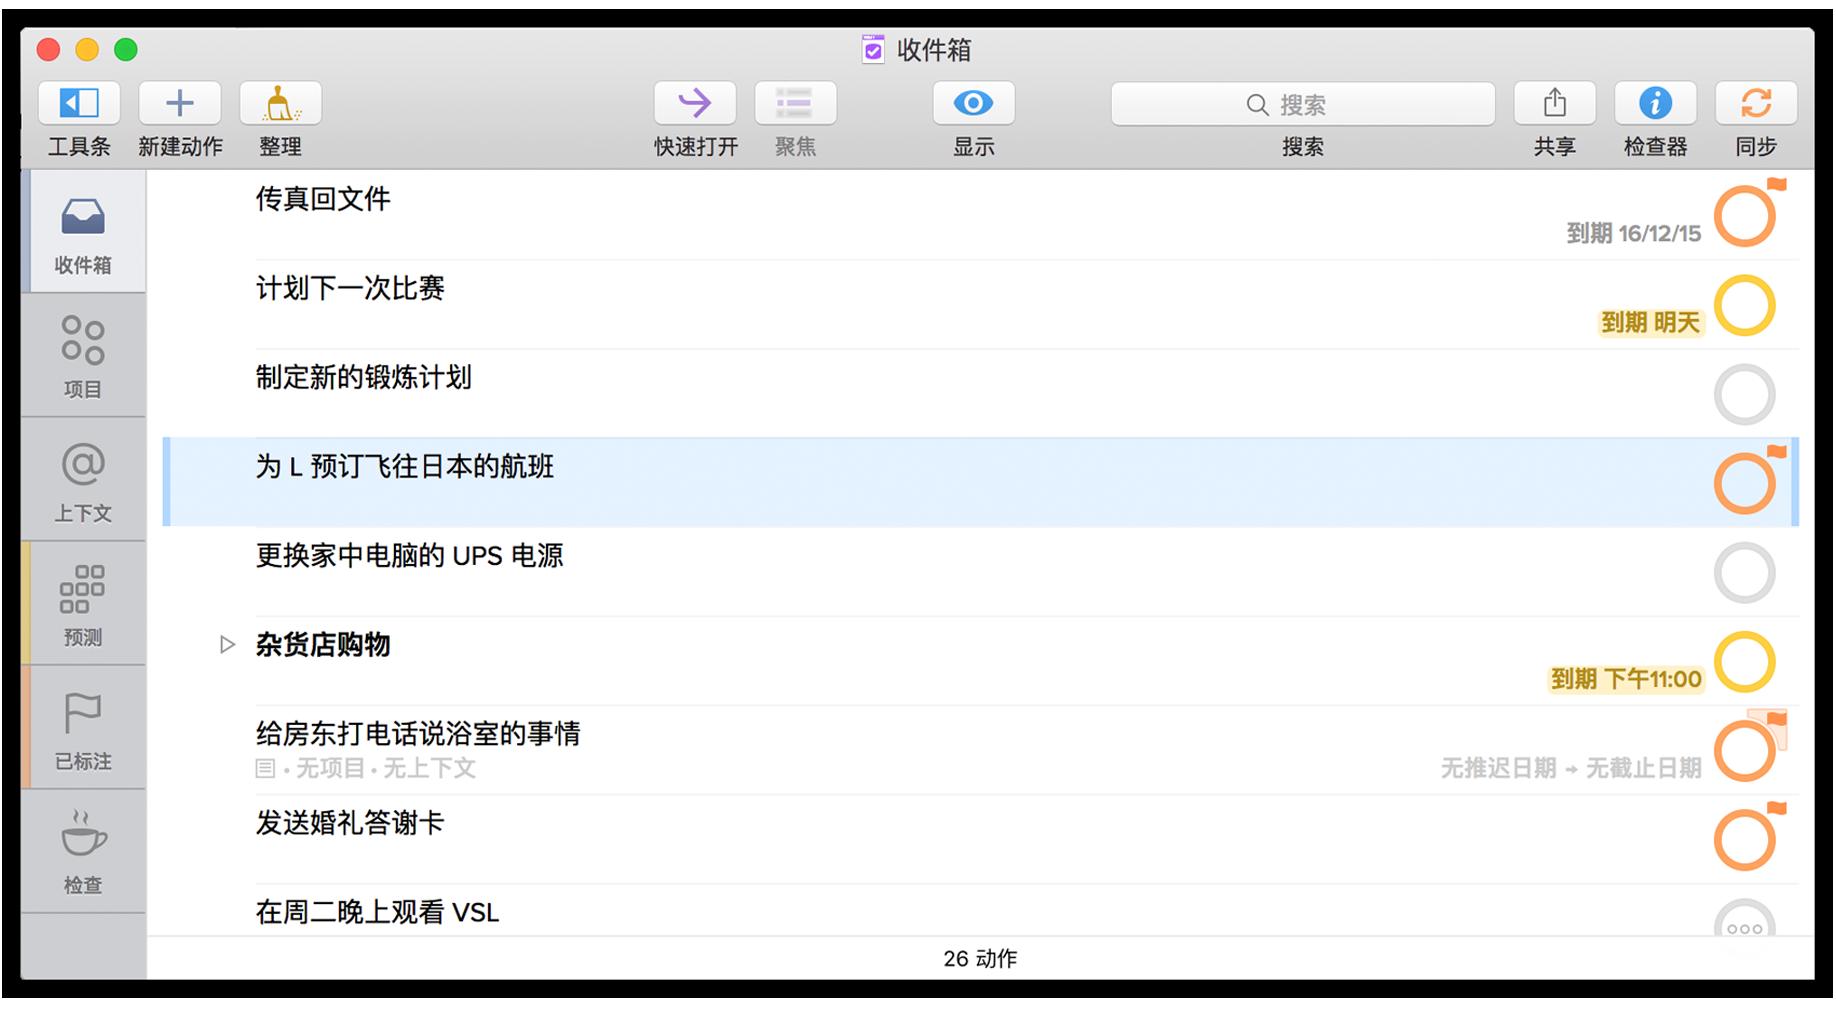 OmniFocus for Mac 官方教程 8—— 已标记 – 知常学社